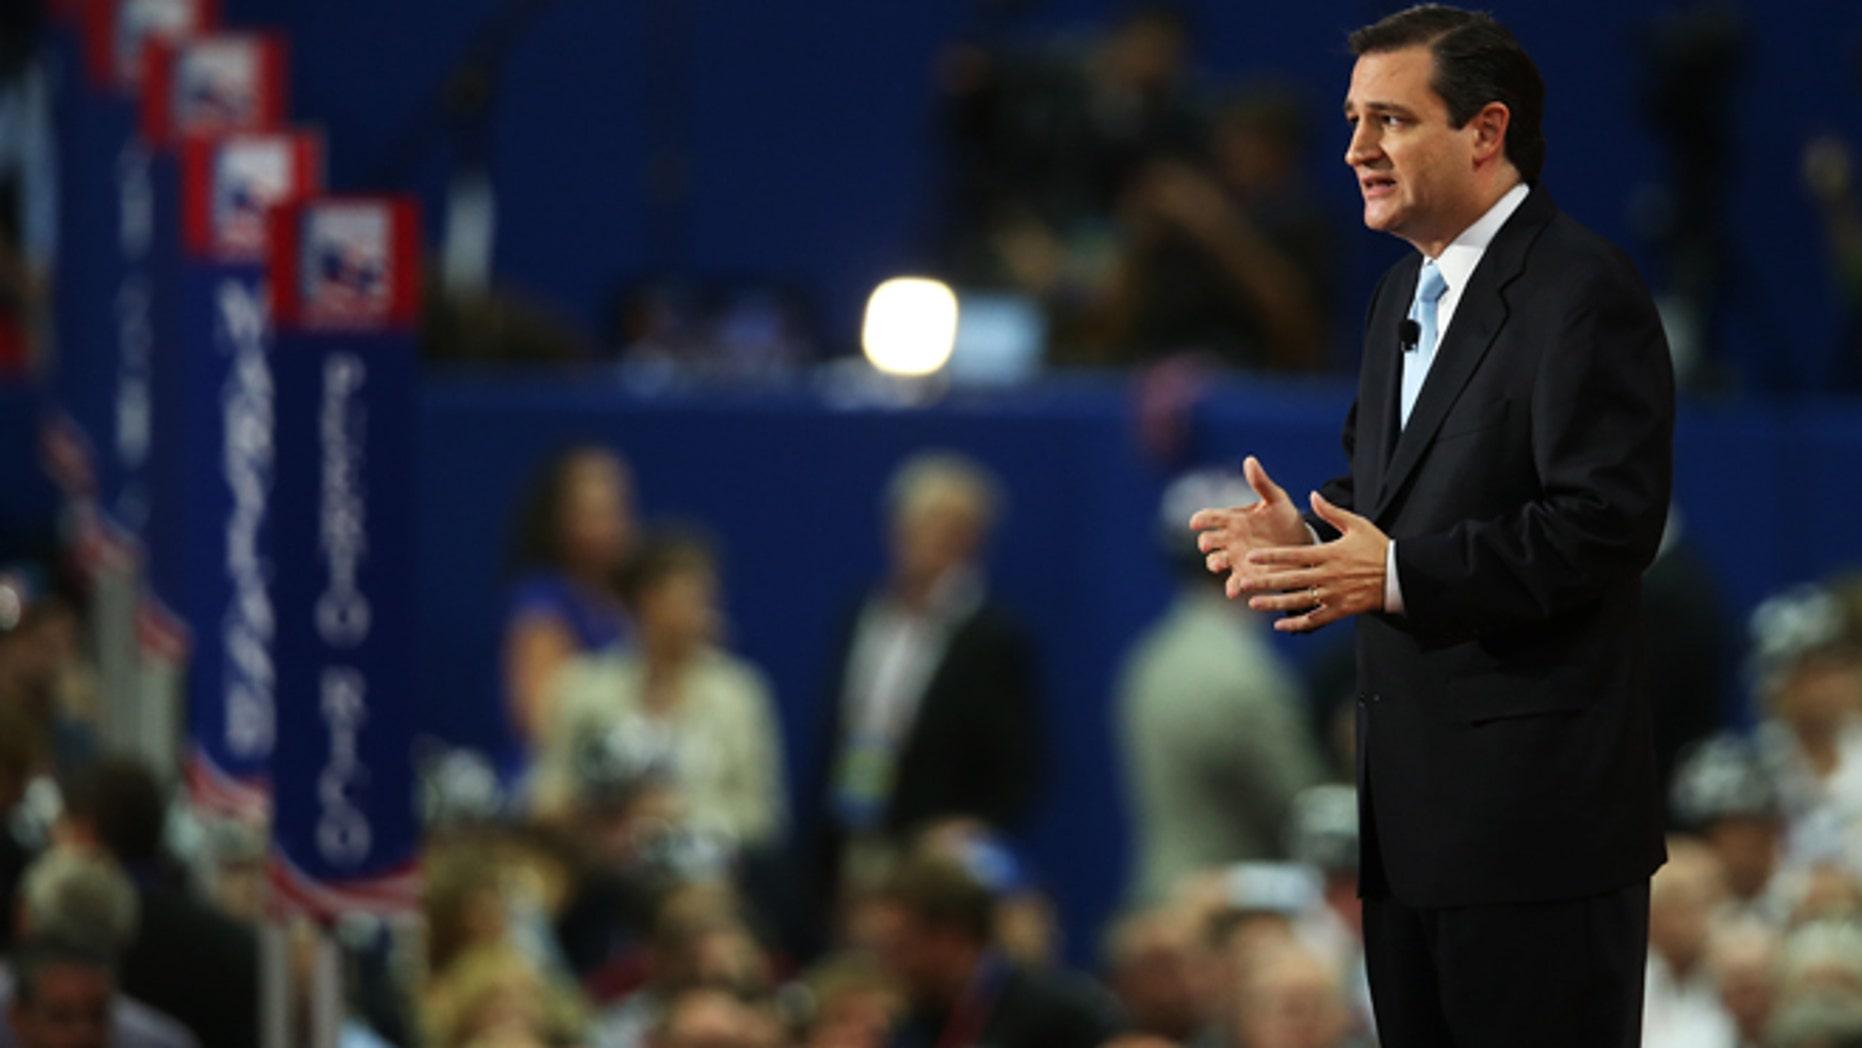 Senator Ted Cruz (Photo by Scott Olson/Getty Images)